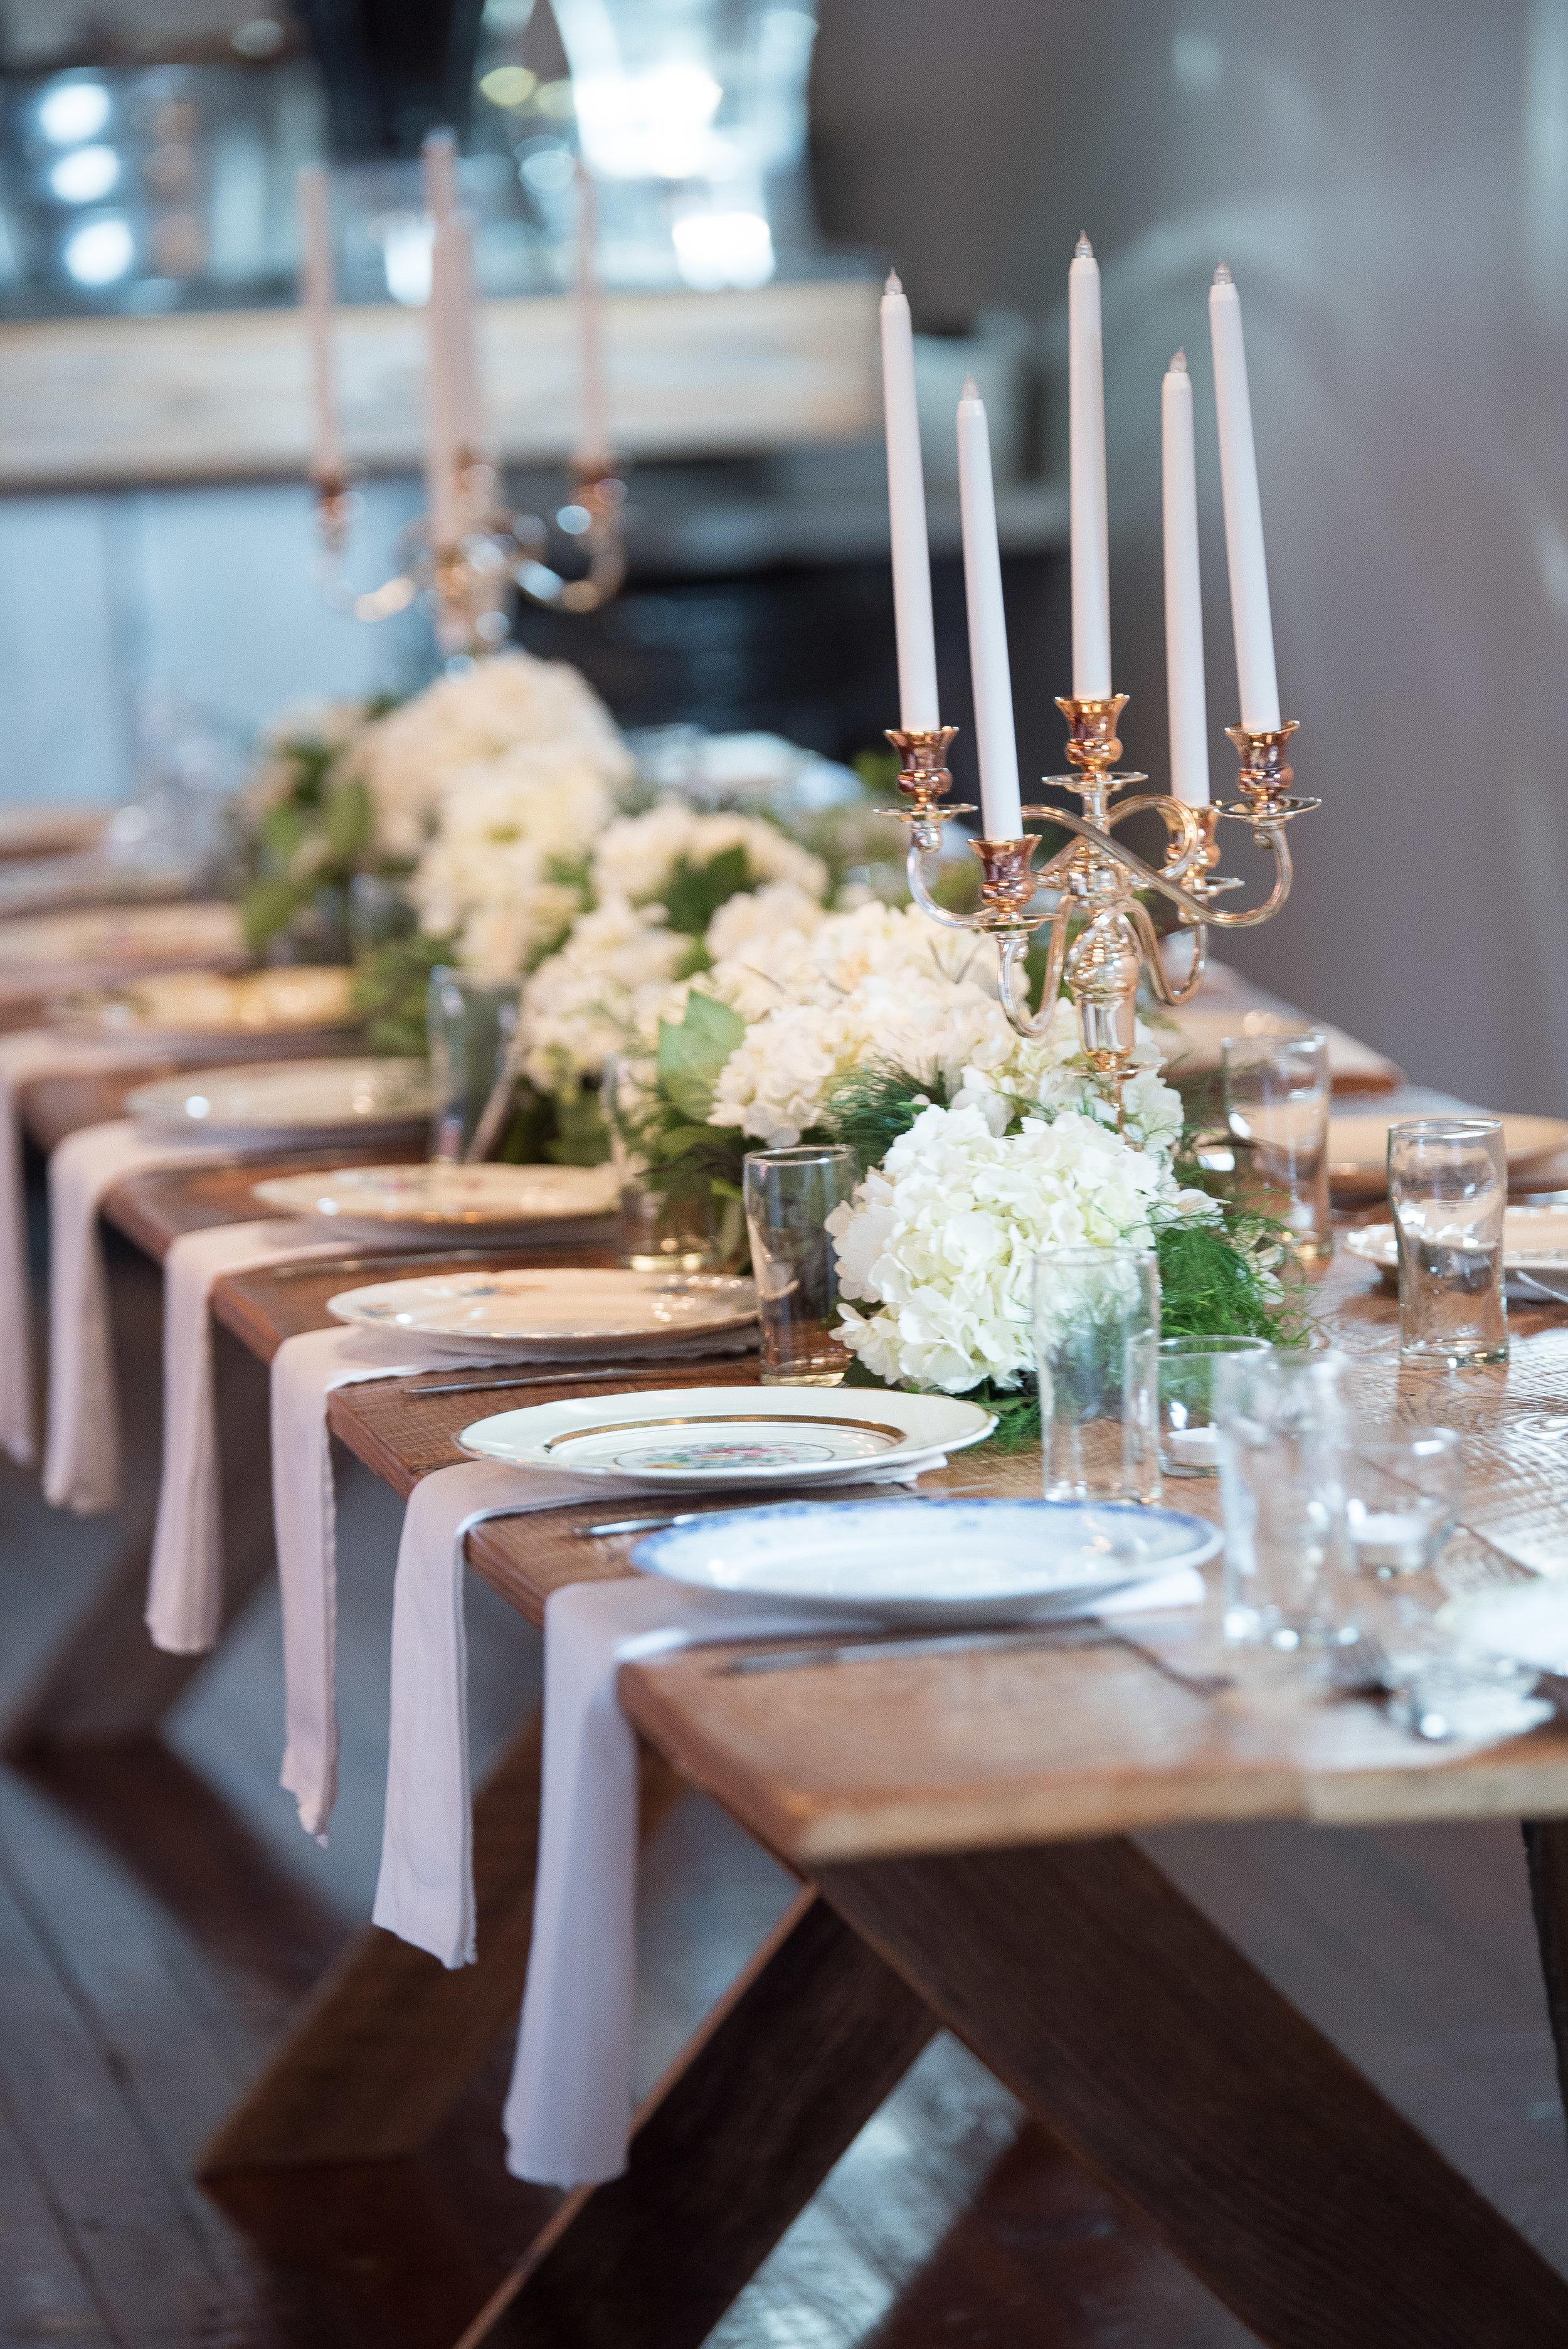 The Roller Mill Events - Winston Salem Weddings - NC Weddings - High Point NC Weddings - Winston Salem Venue - Yasmin Leonard Photography-7.jpg